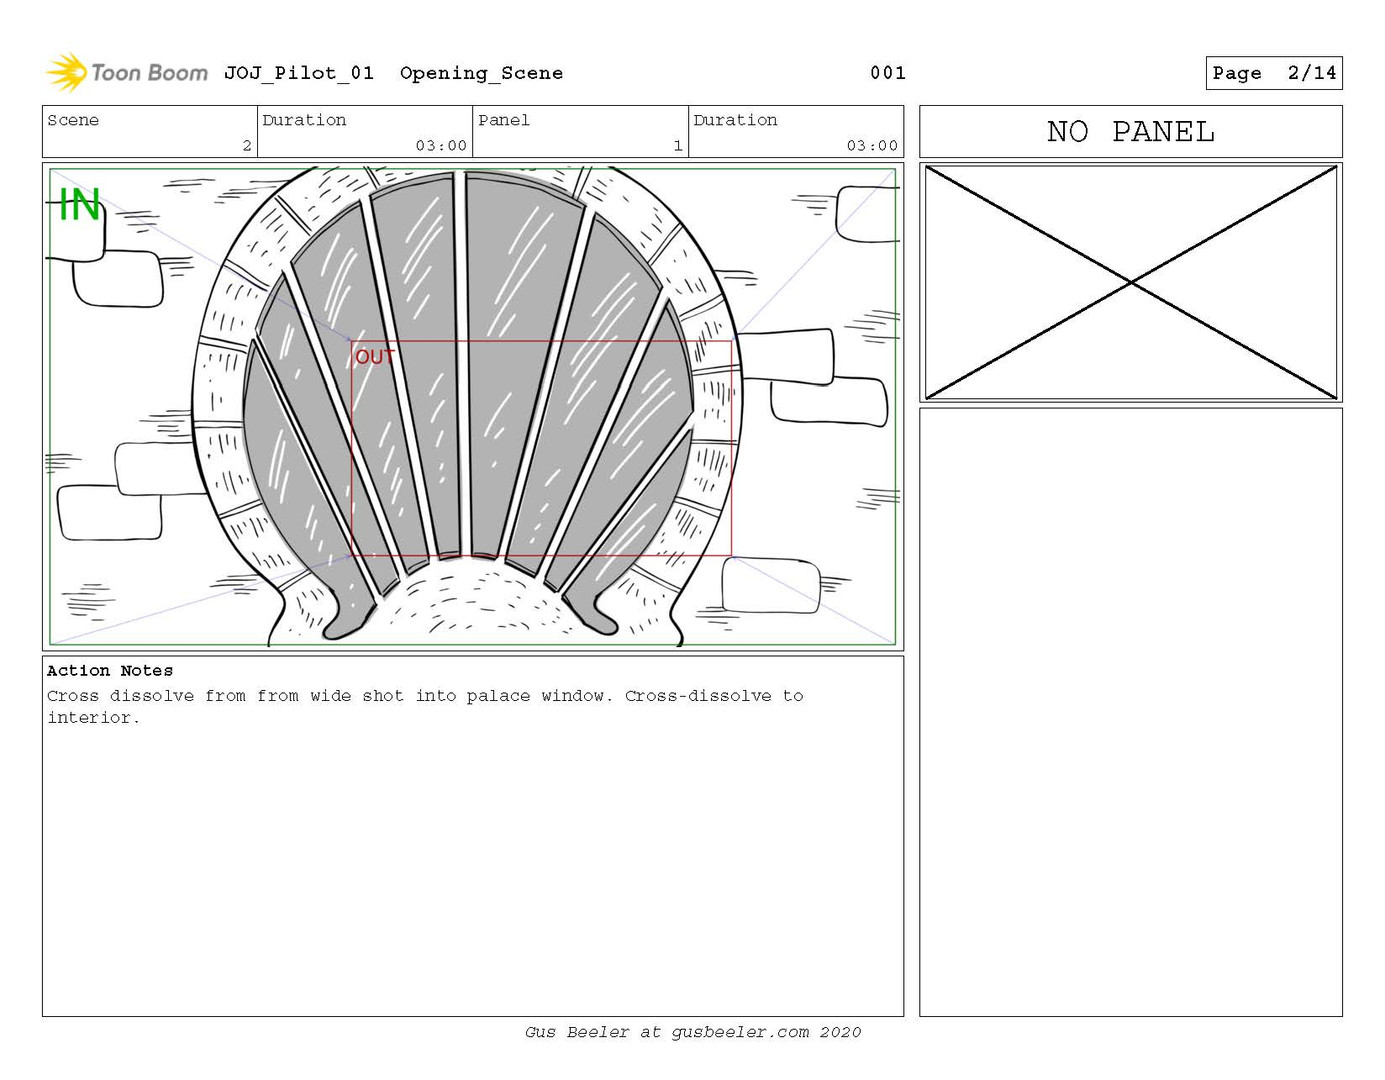 Abeeler_JOJ_Pilot_002_Page_03.jpg